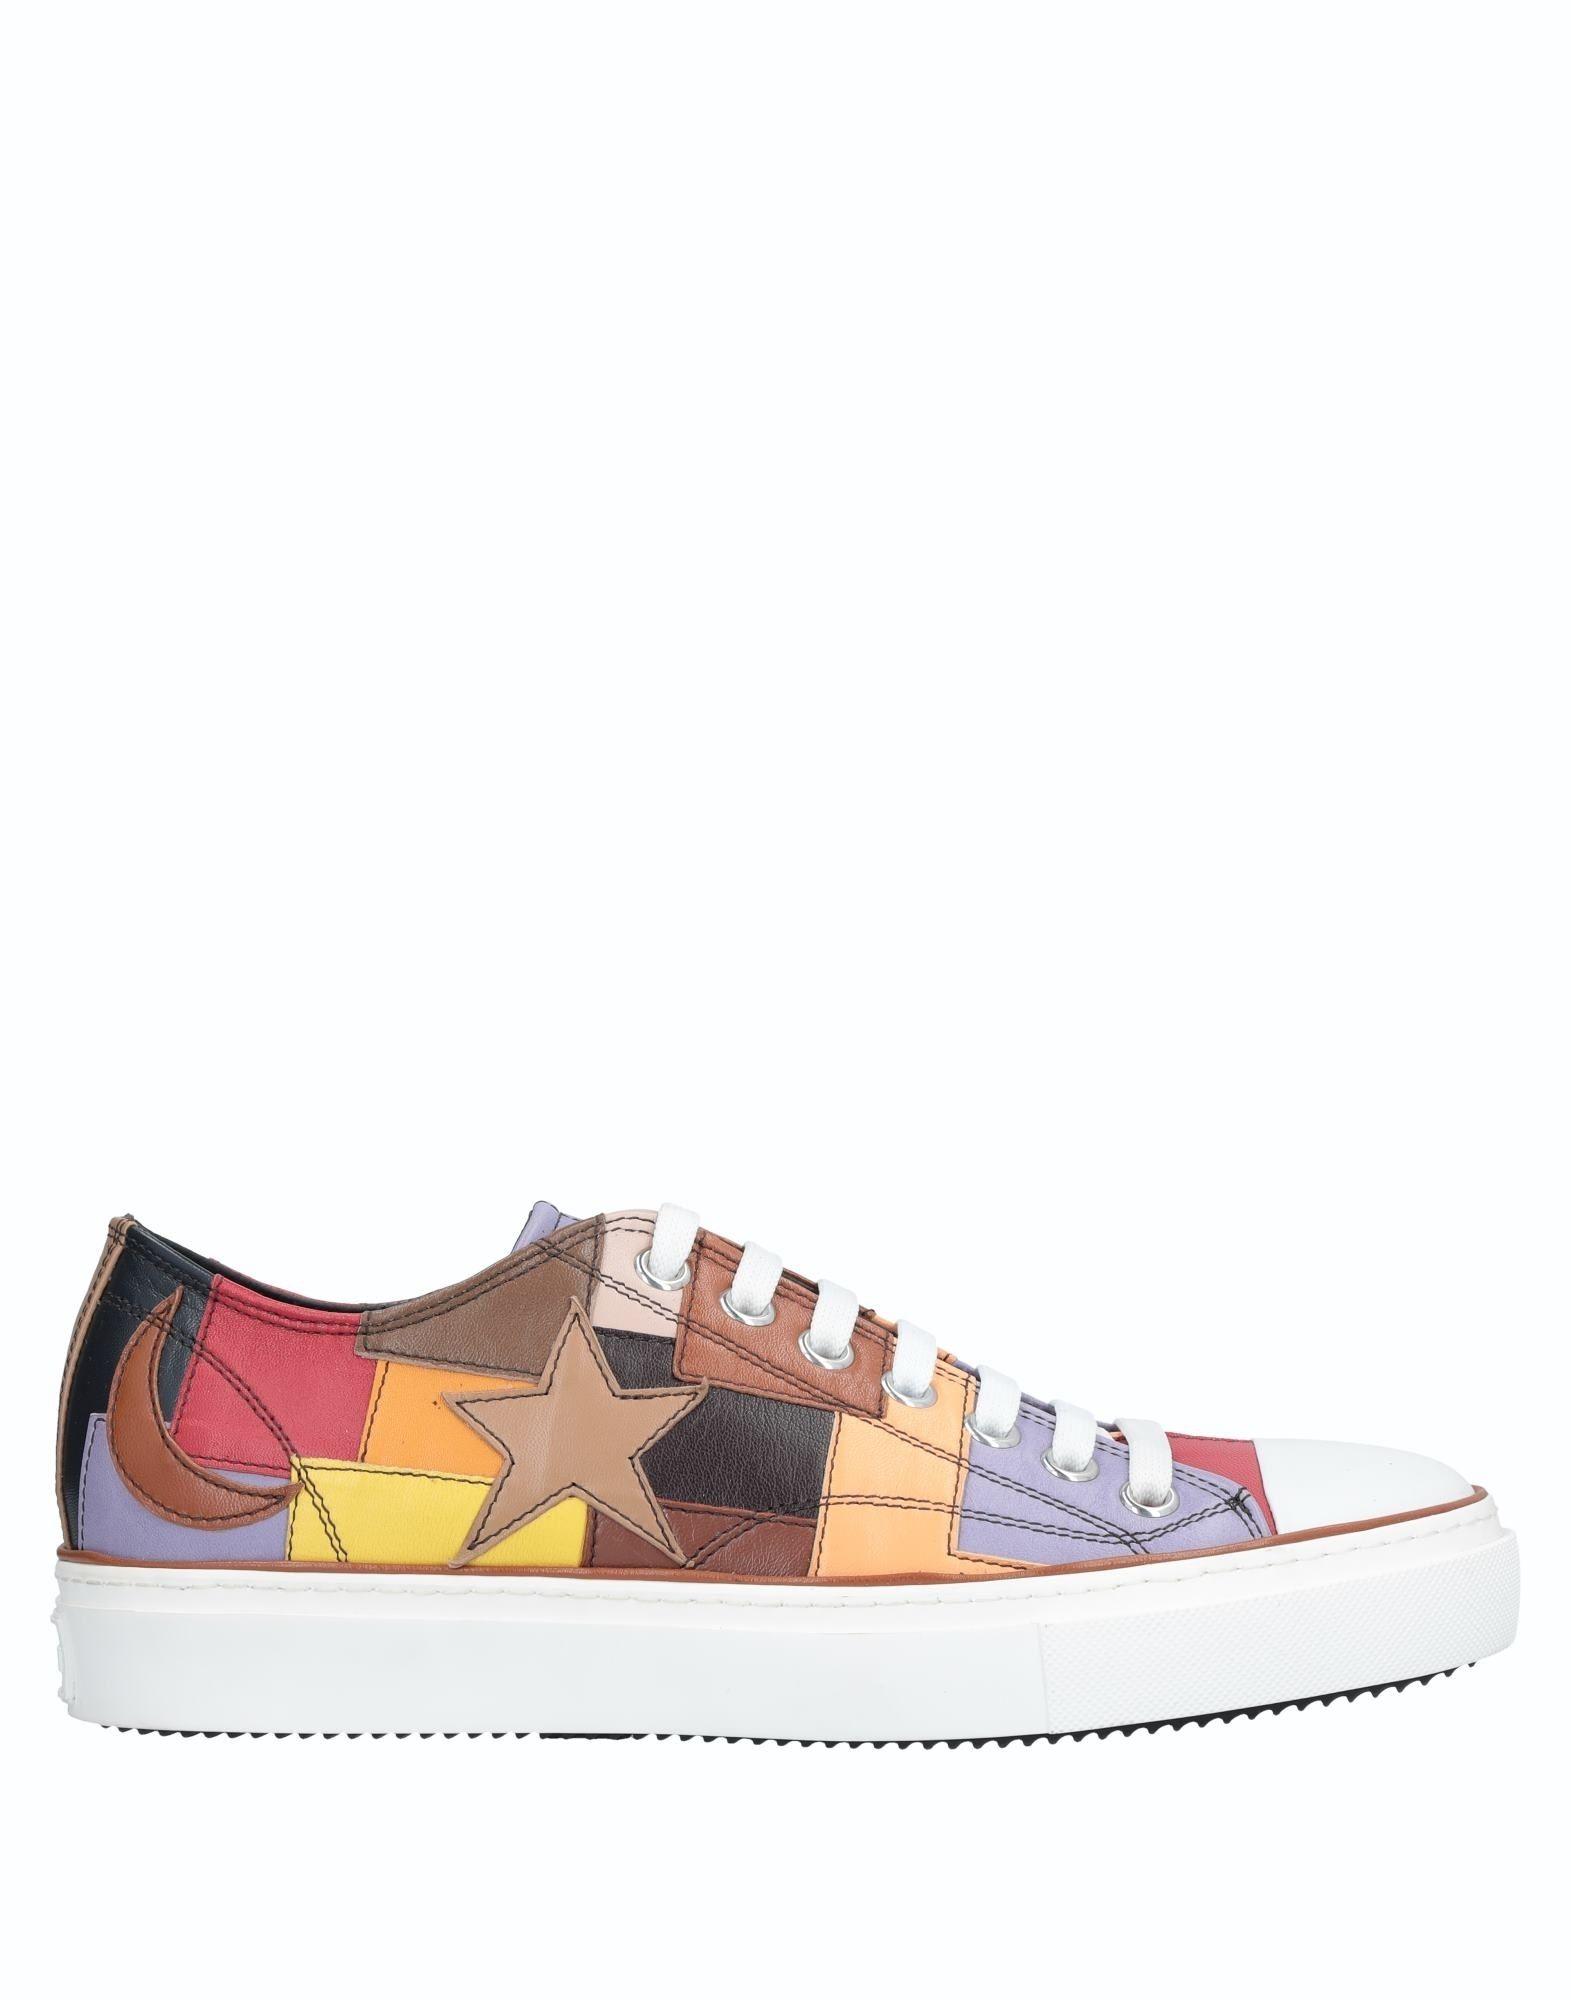 Roberto Cavalli Sneakers Herren  11539019WR Gute Qualität beliebte Schuhe